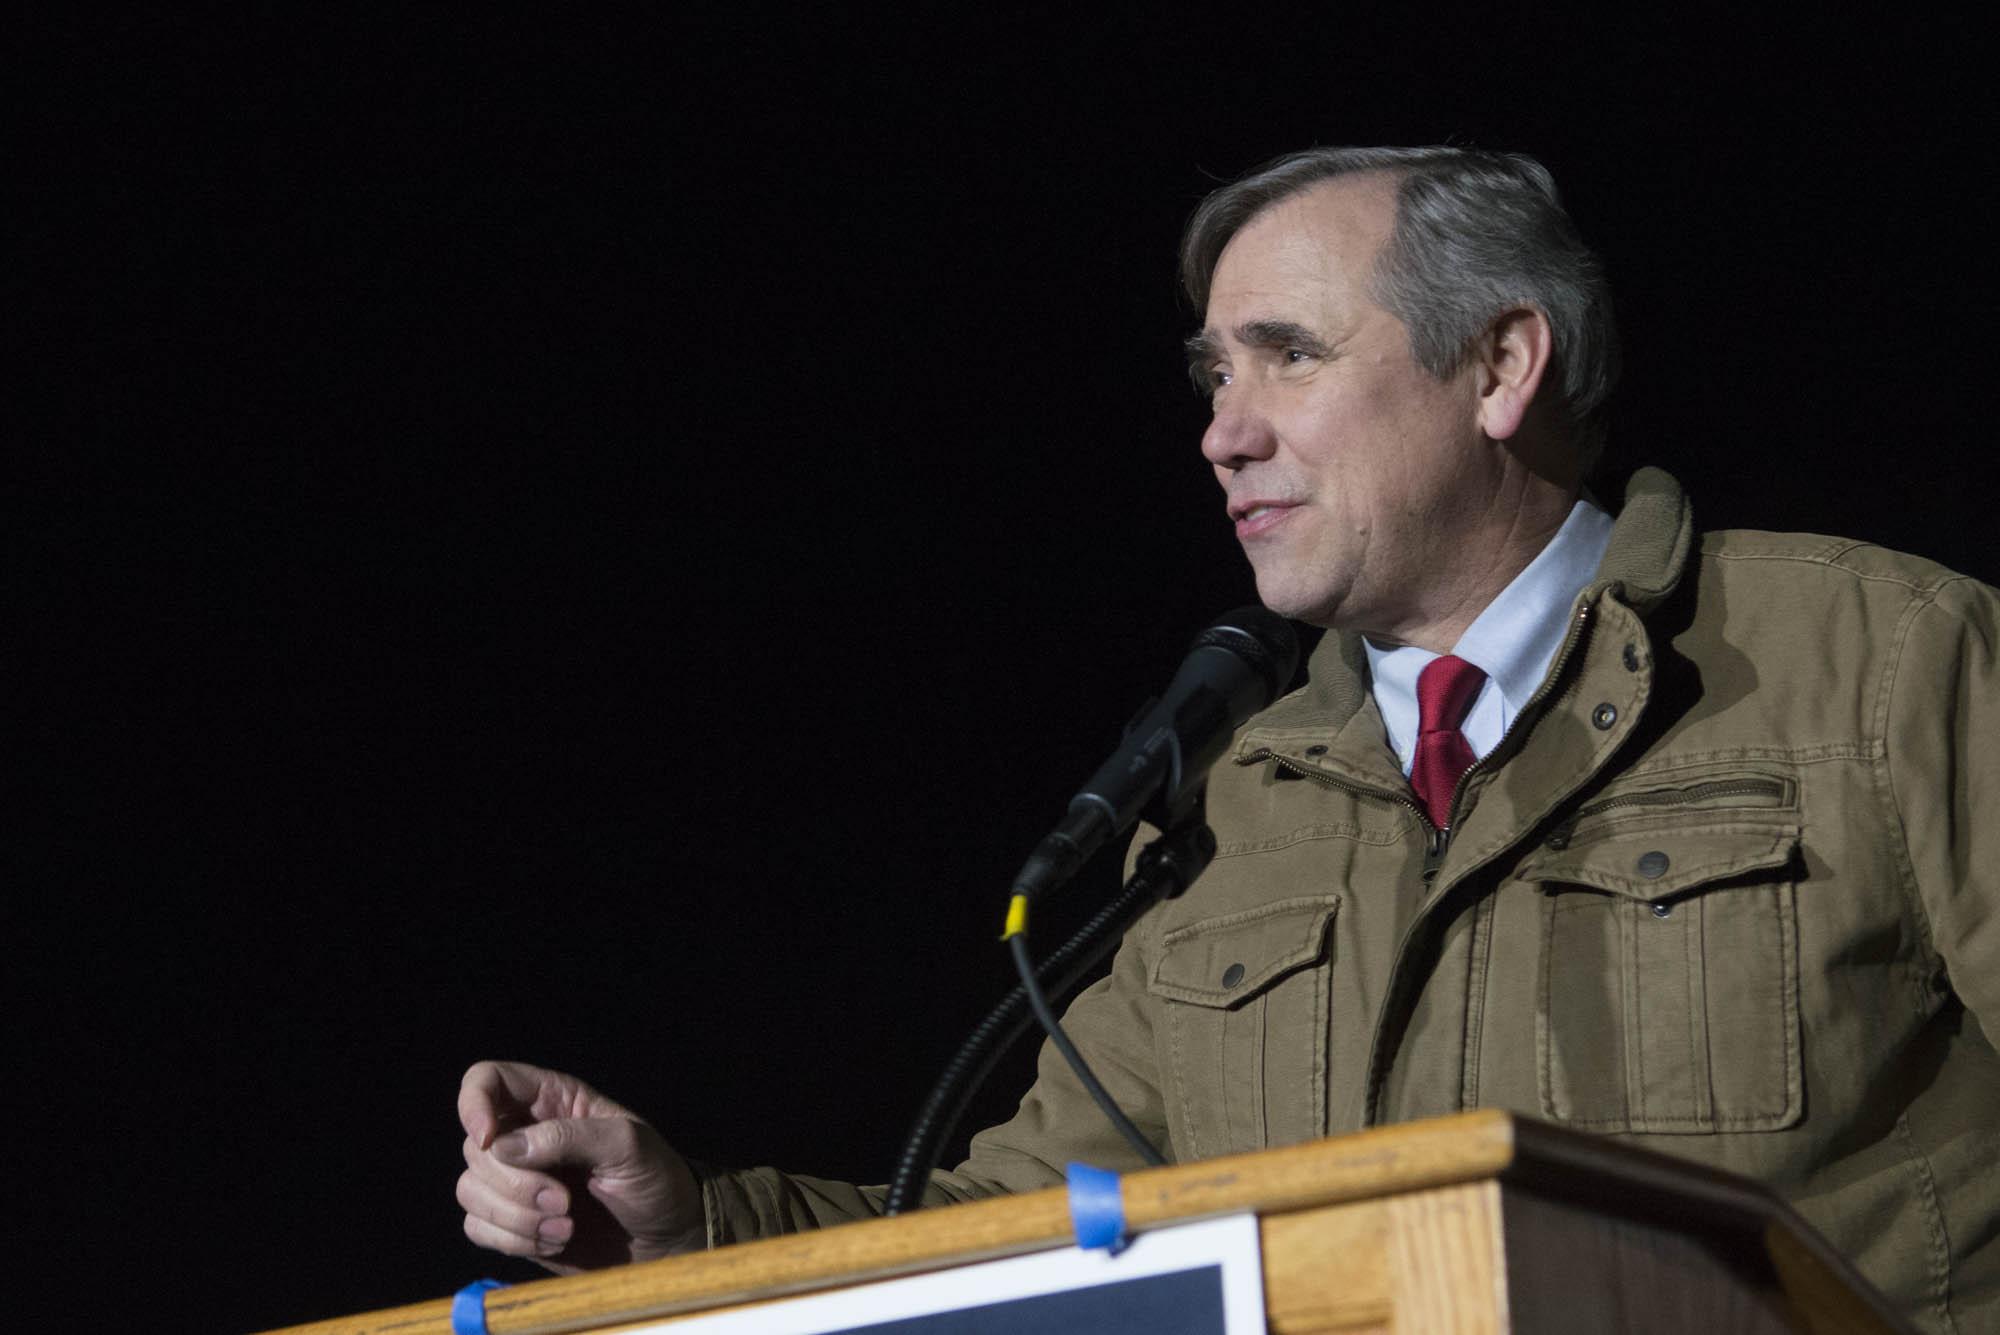 Jeff Merkley, Senator from Oregon